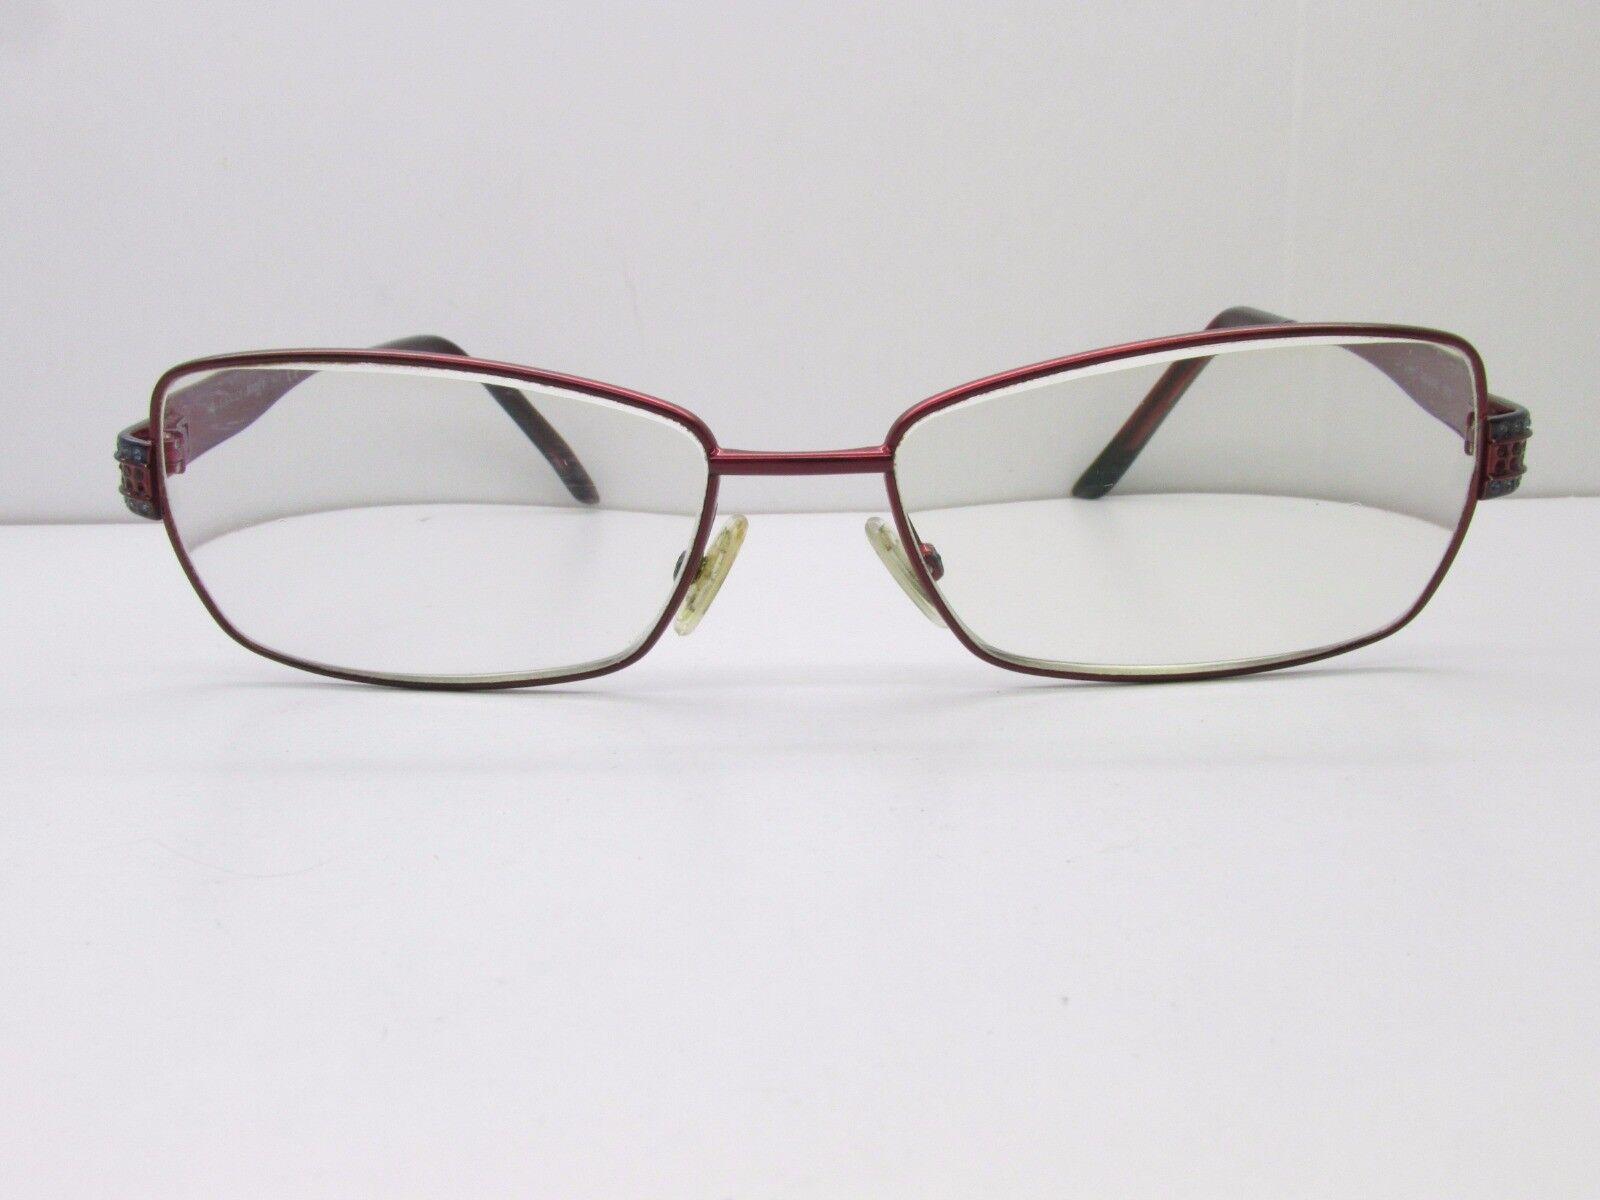 Gucci GG 2750 Eyewear Frames 56-15-140 Gold Rectangle Tv6 32009 | eBay